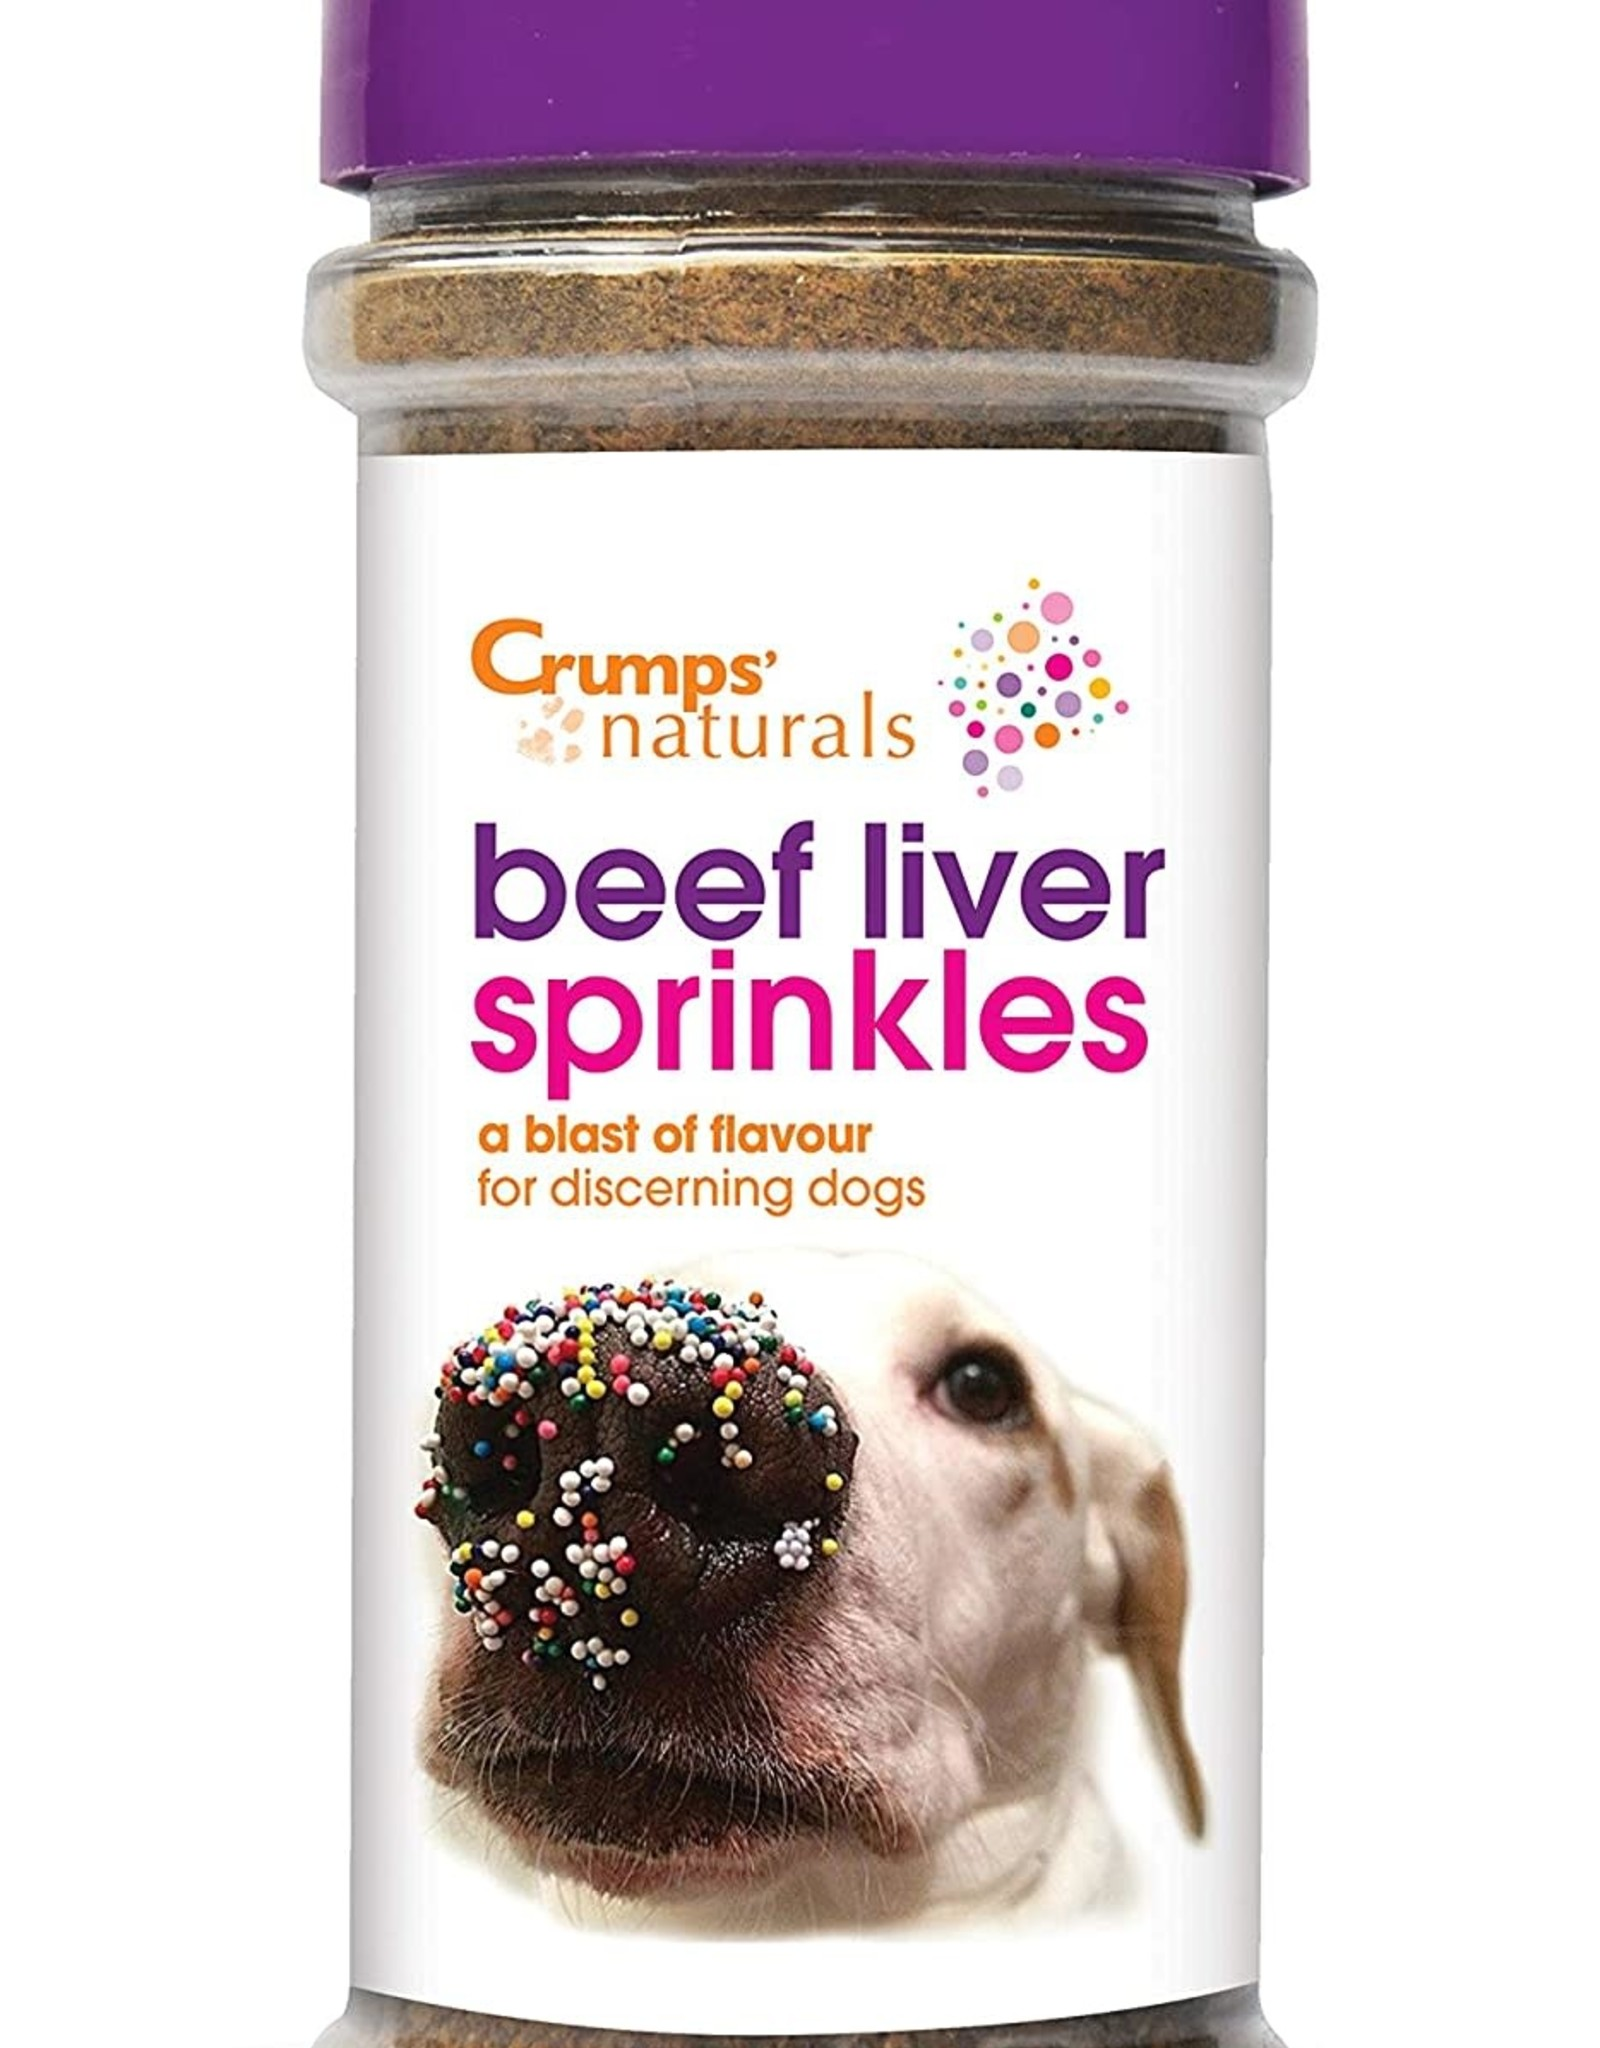 Crumps Natural Crumps Beef Liver Sprinkles